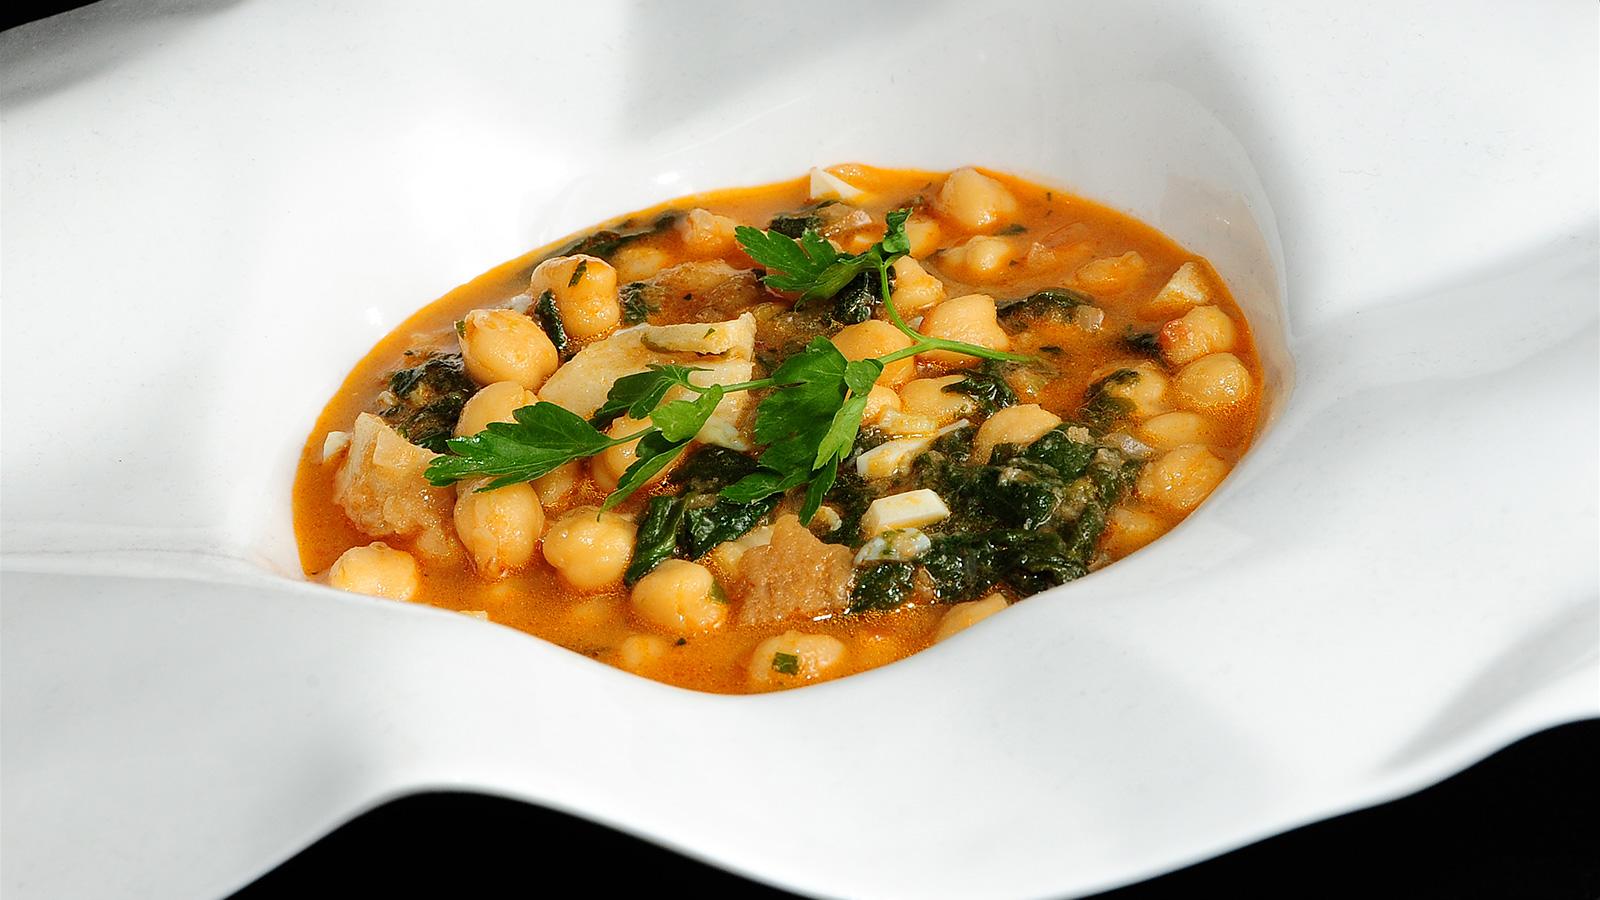 Potaje de garbanzos con bacalao koldo royo receta - Potaje con bacalao y espinacas ...